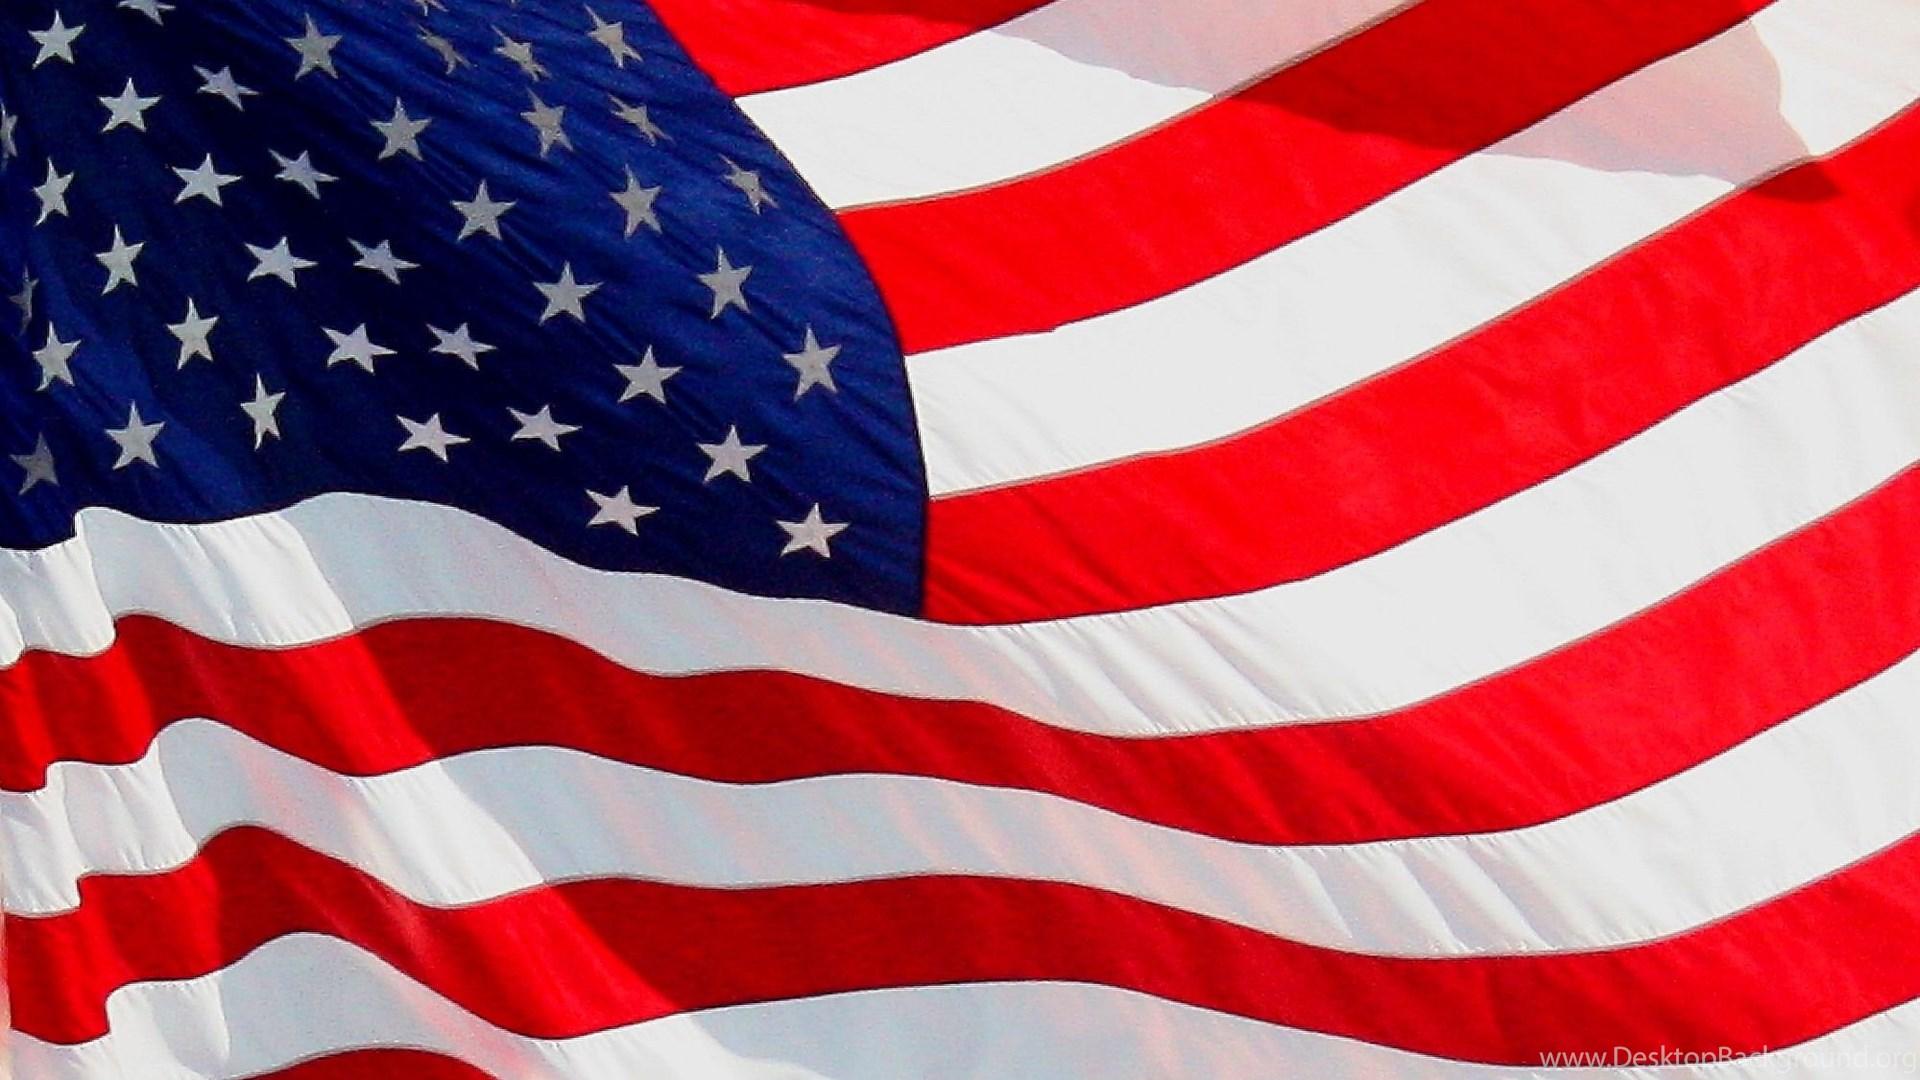 Desktop Eagle And American Flag Pictures Wallpapers Desktop Background